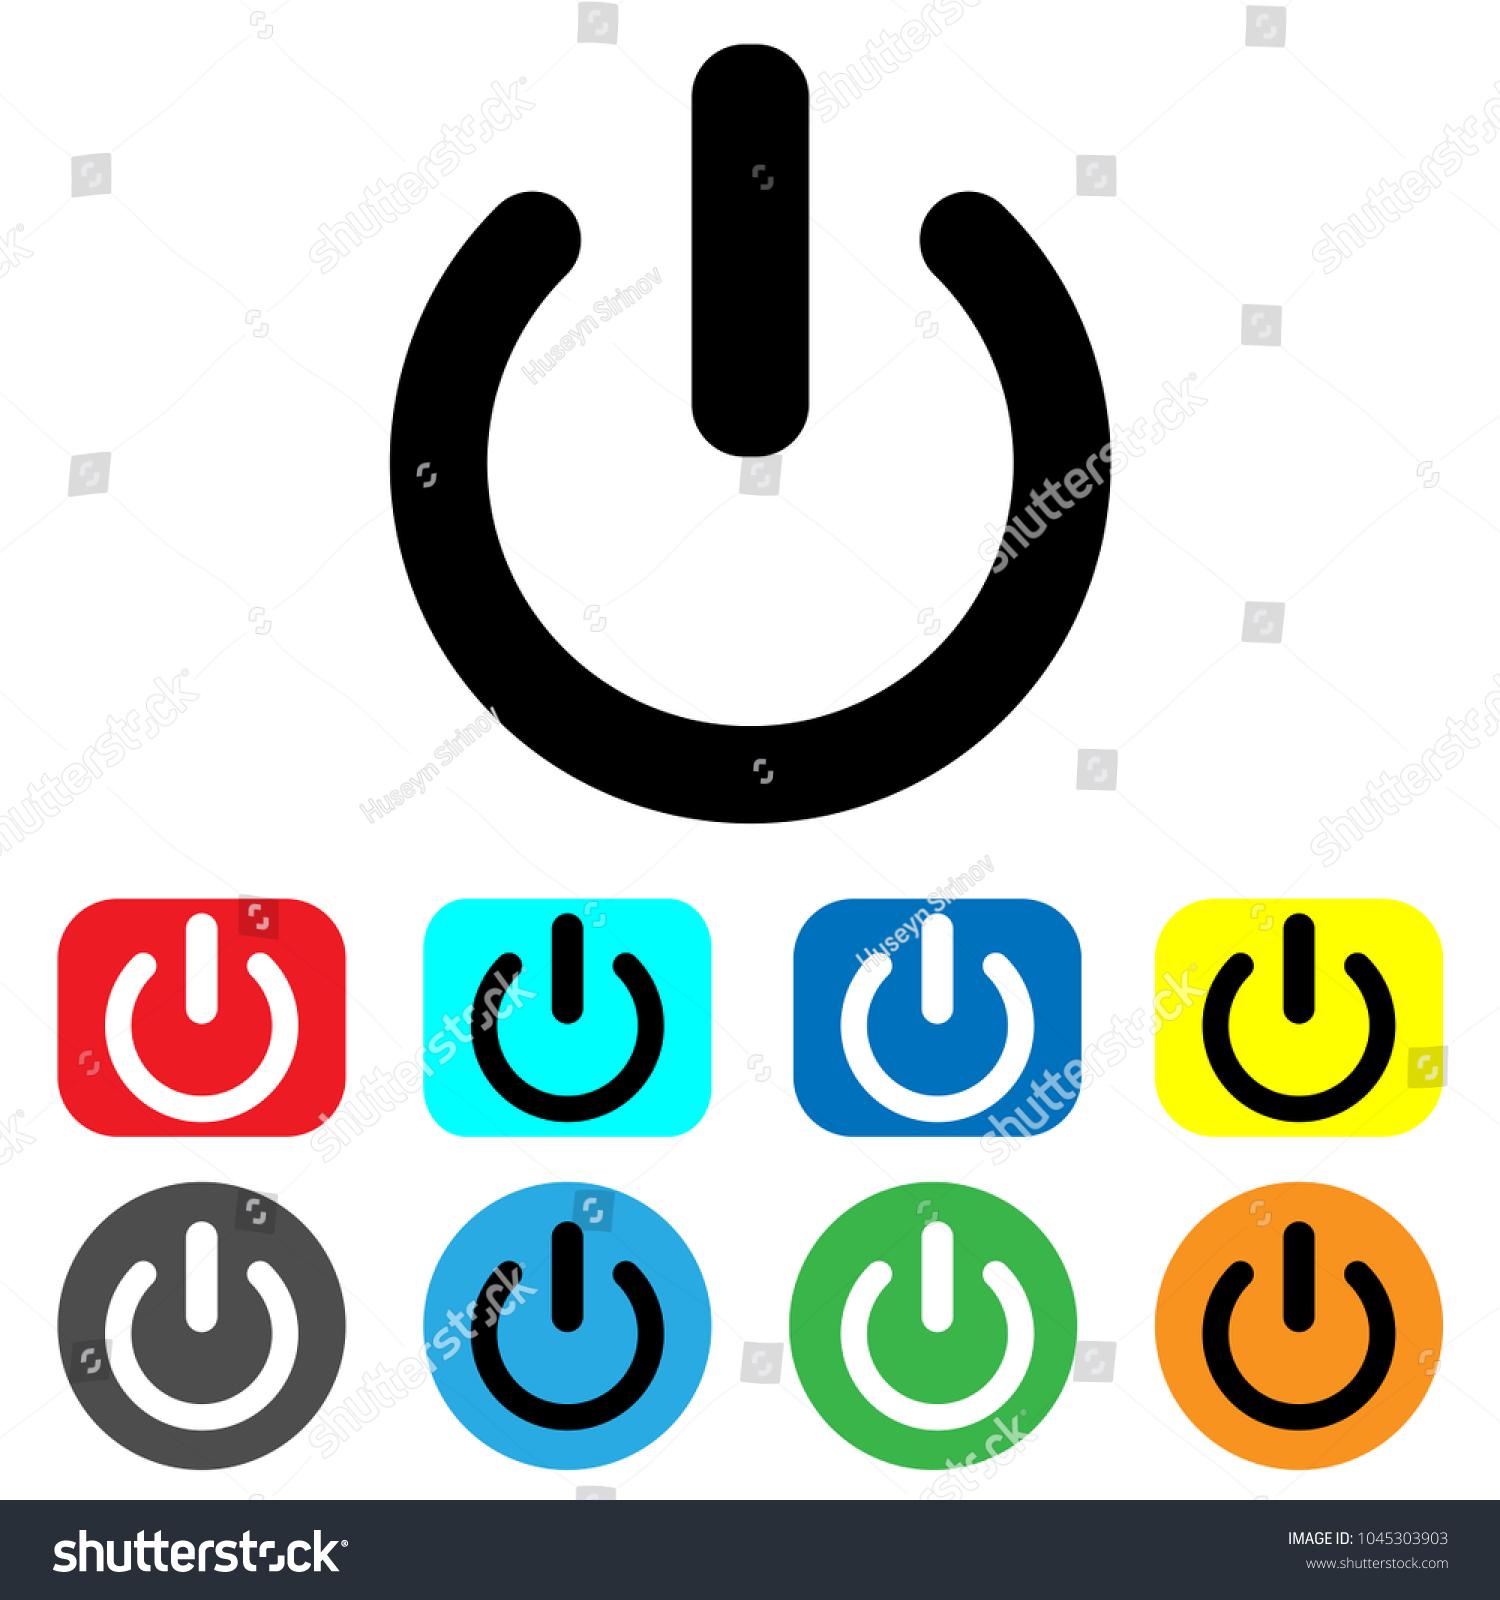 Shutdown icon vector power icon onoff stock vector 1045303903 shutdown icon vector power icon onoff switch shut down symbol biocorpaavc Images